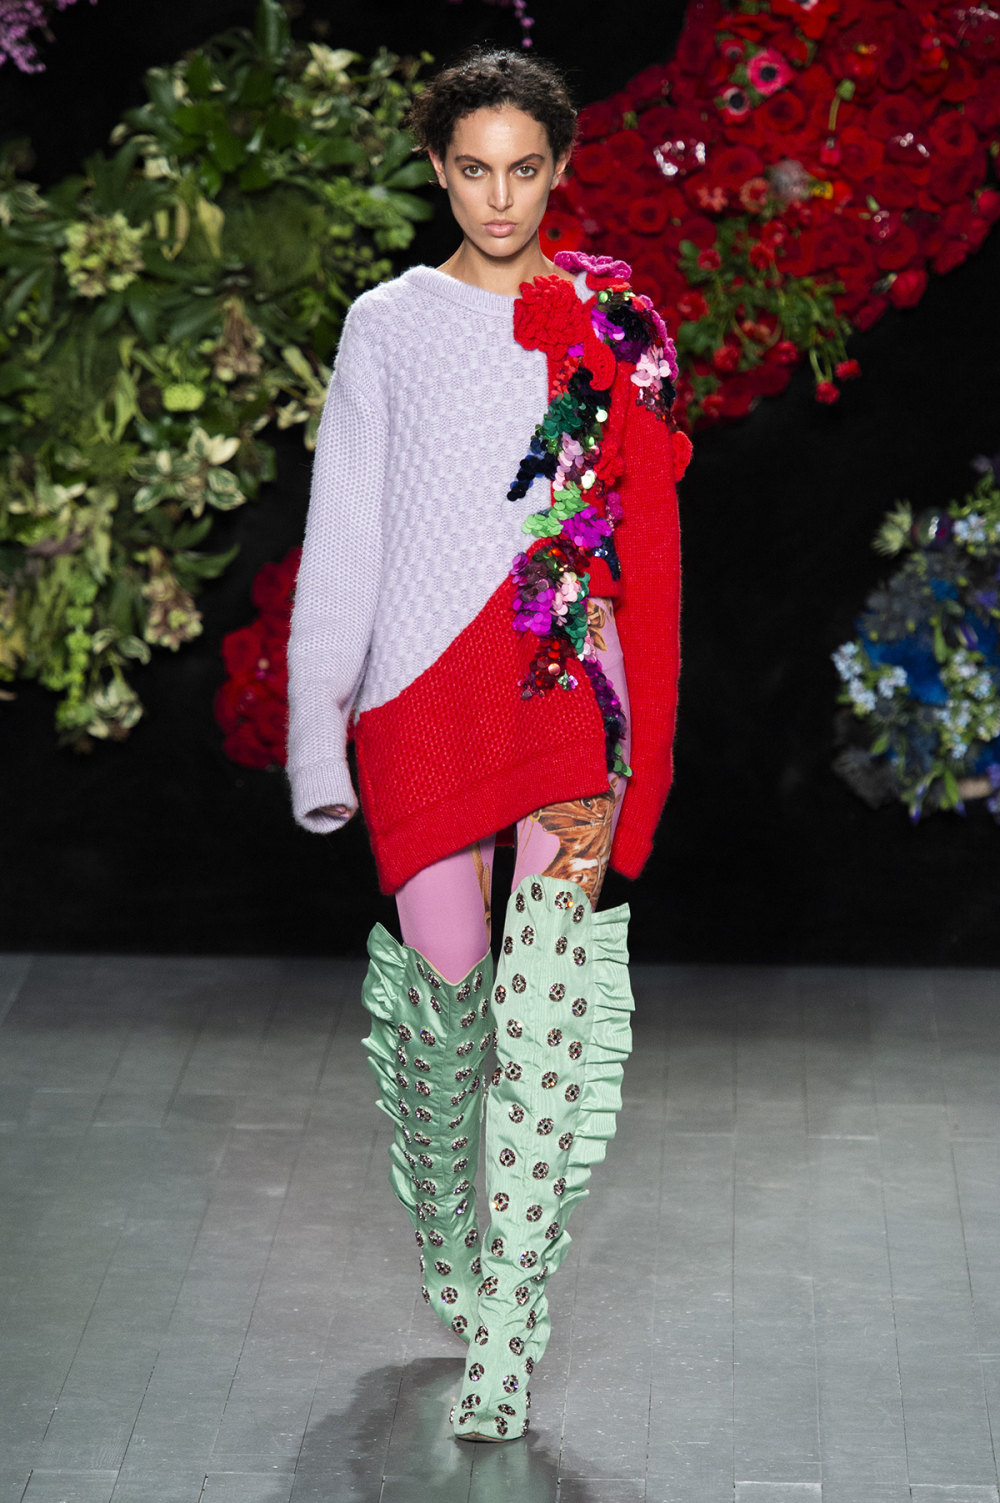 Roberta Einer时装系列格子呢西装外套收紧腰部霓虹色腰带连帽衫-14.jpg